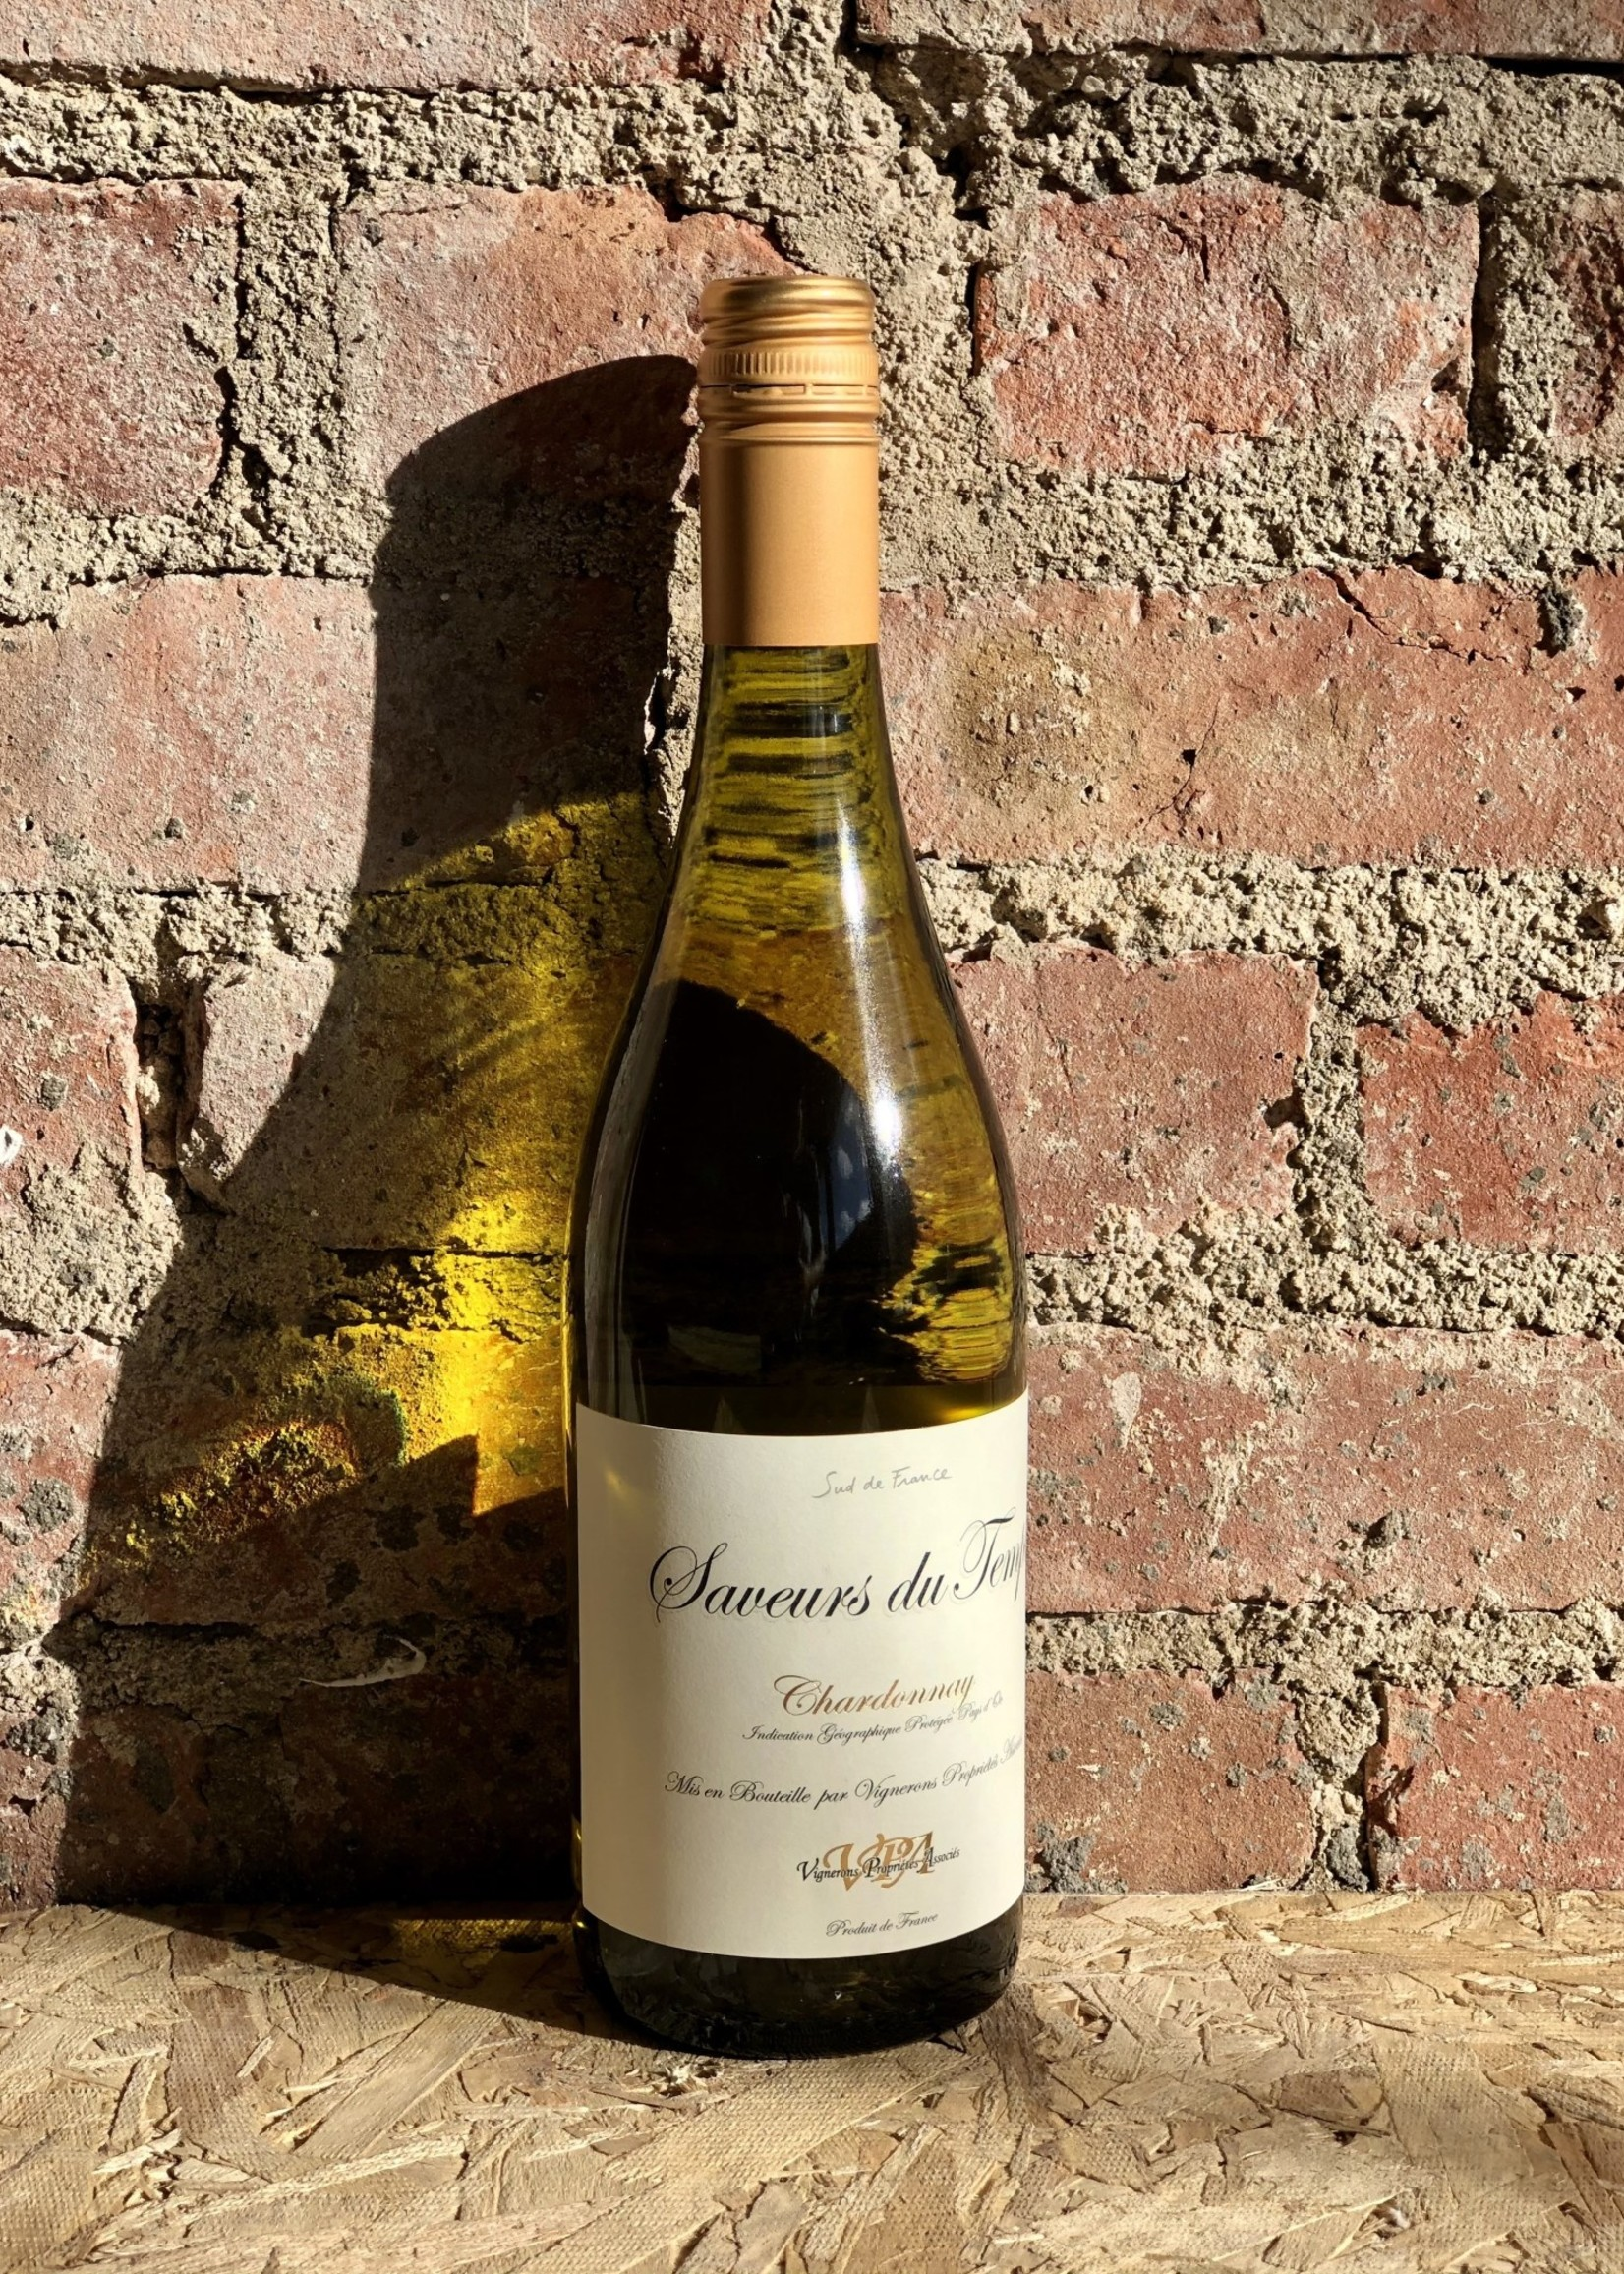 Saveurs du Temps Chardonnay 2019 (Pays D'Oc, France)